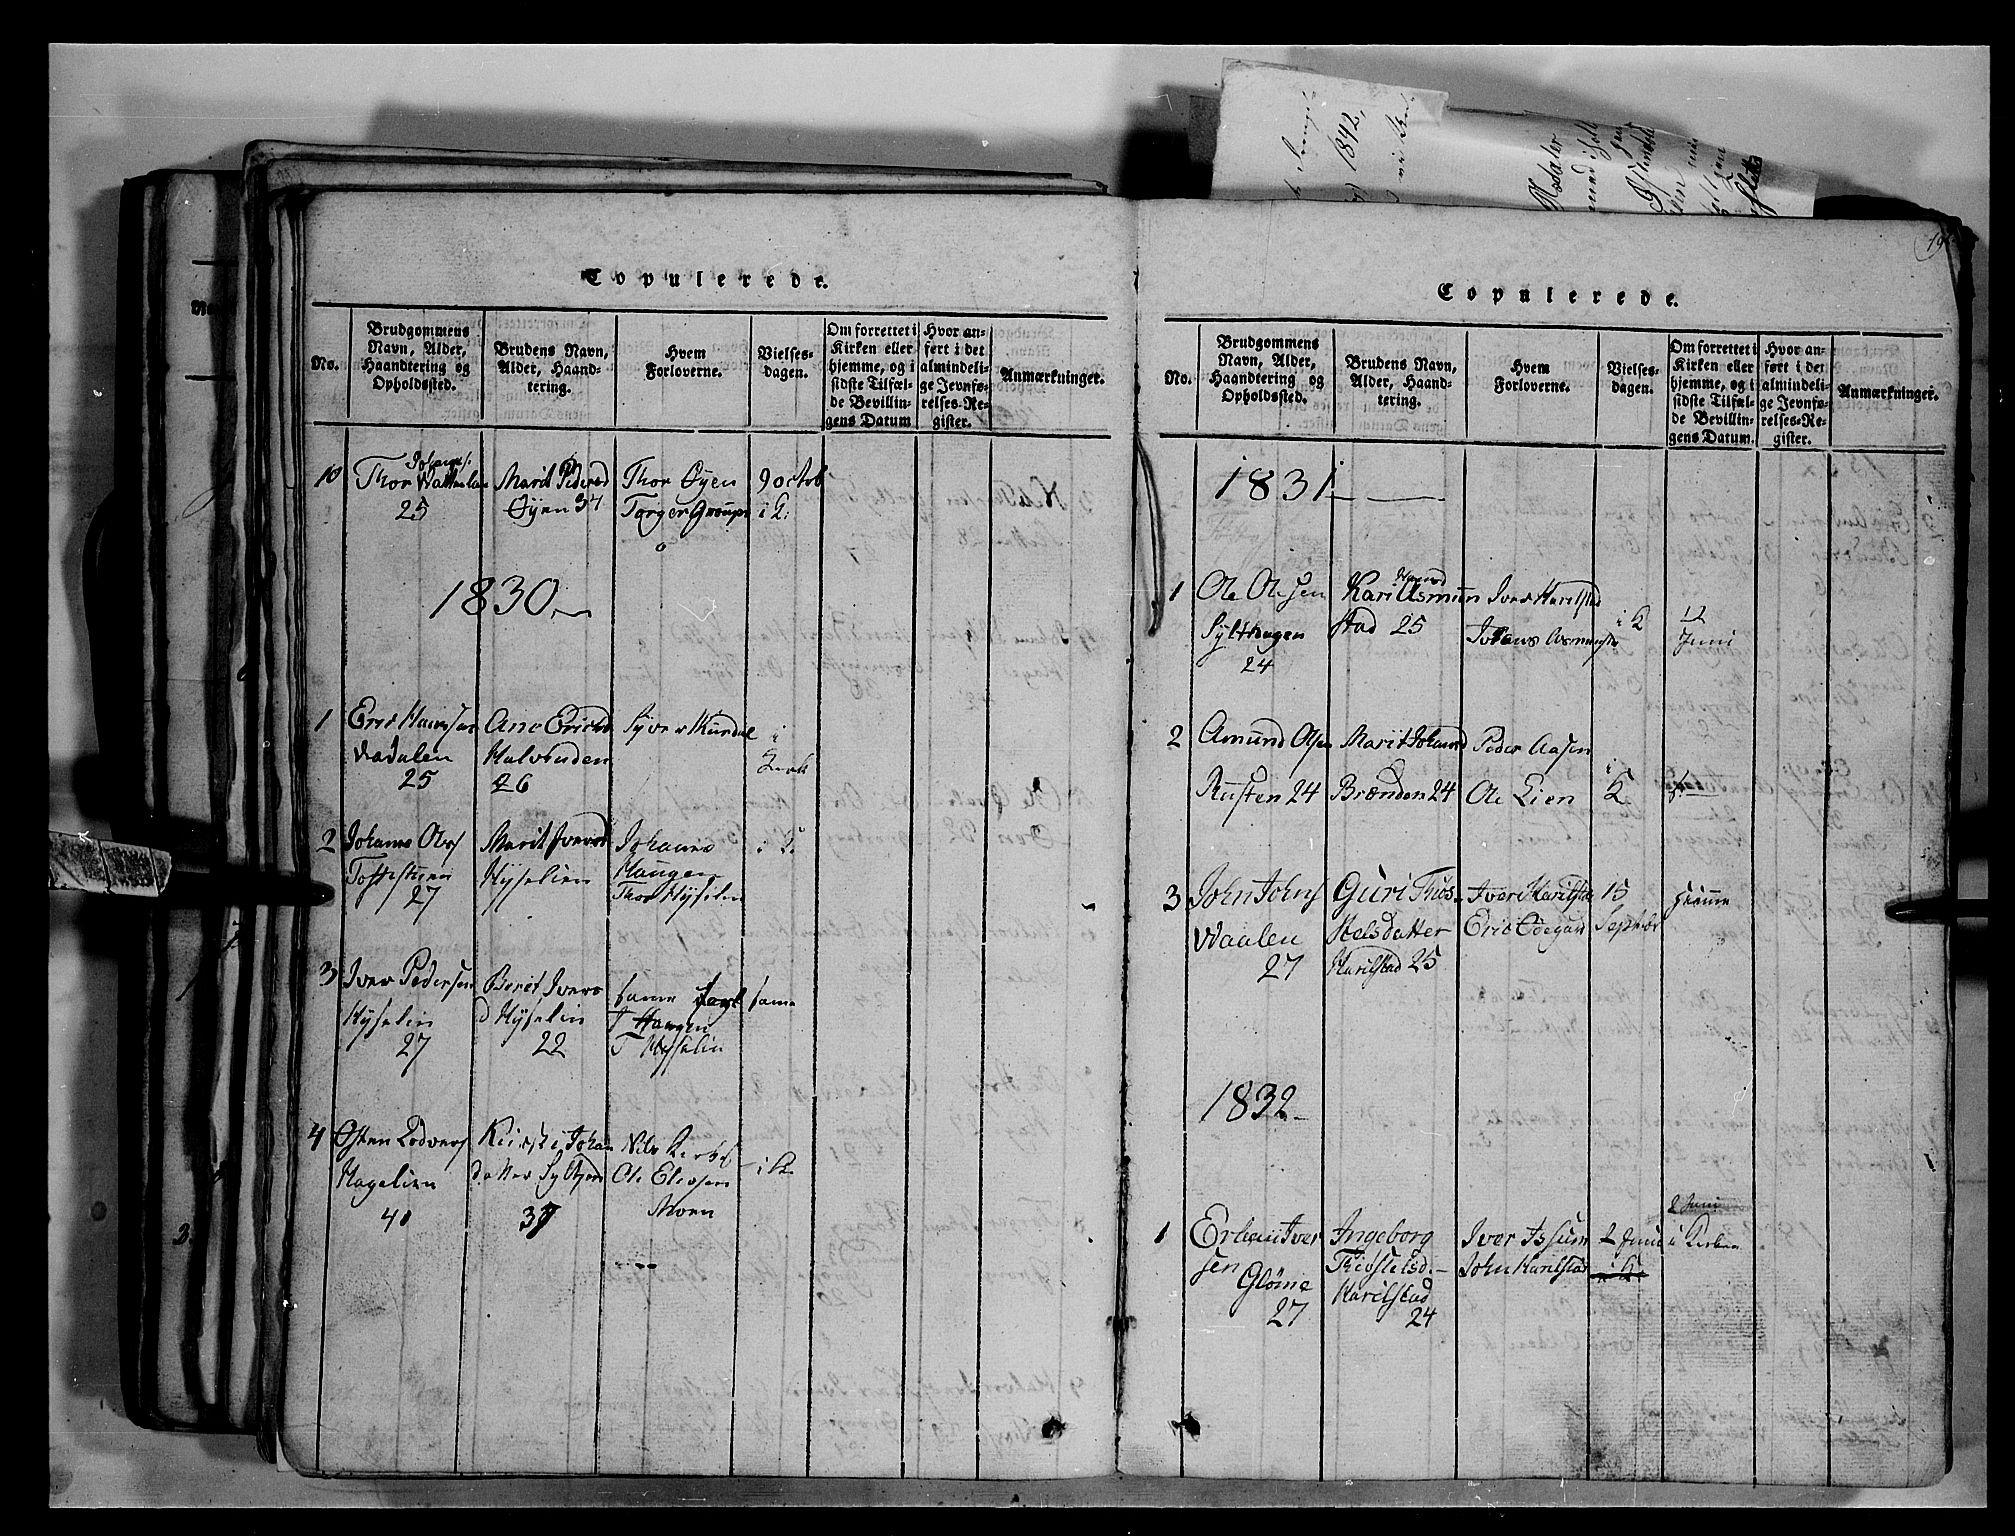 SAH, Fron prestekontor, H/Ha/Hab/L0003: Klokkerbok nr. 3, 1816-1850, s. 198